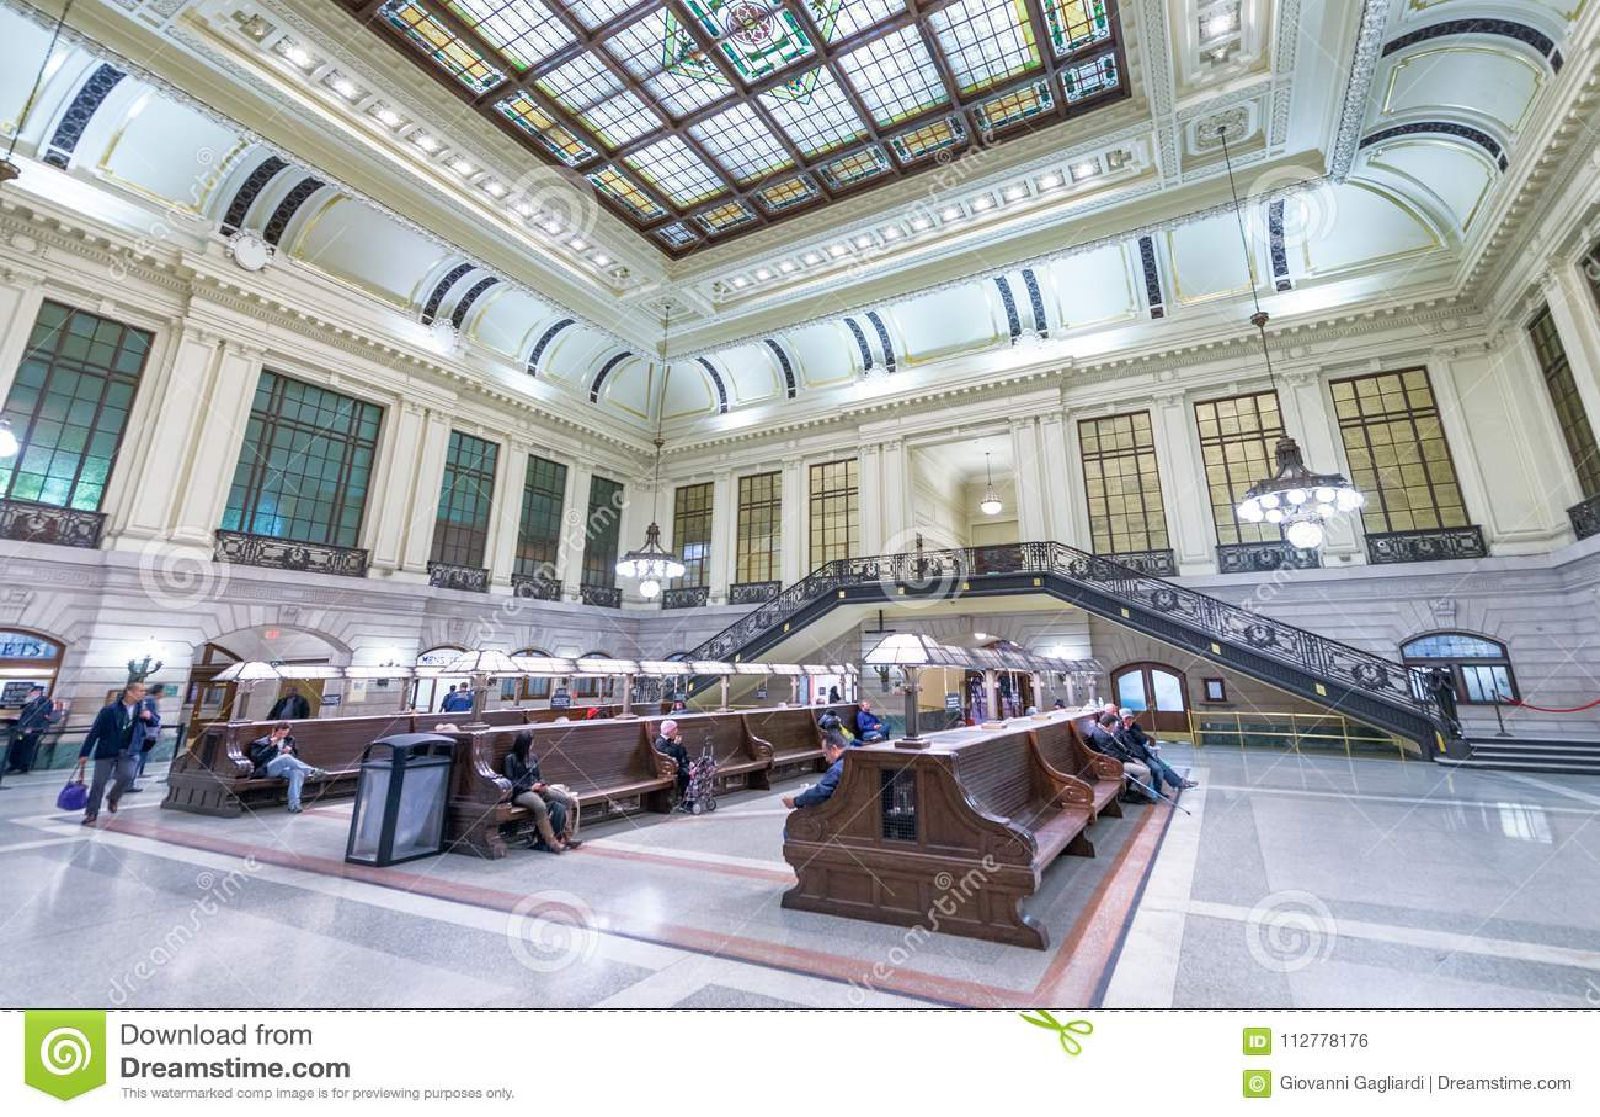 jersey city october 20 2015 interior of hoboken train station rh dreamstime com